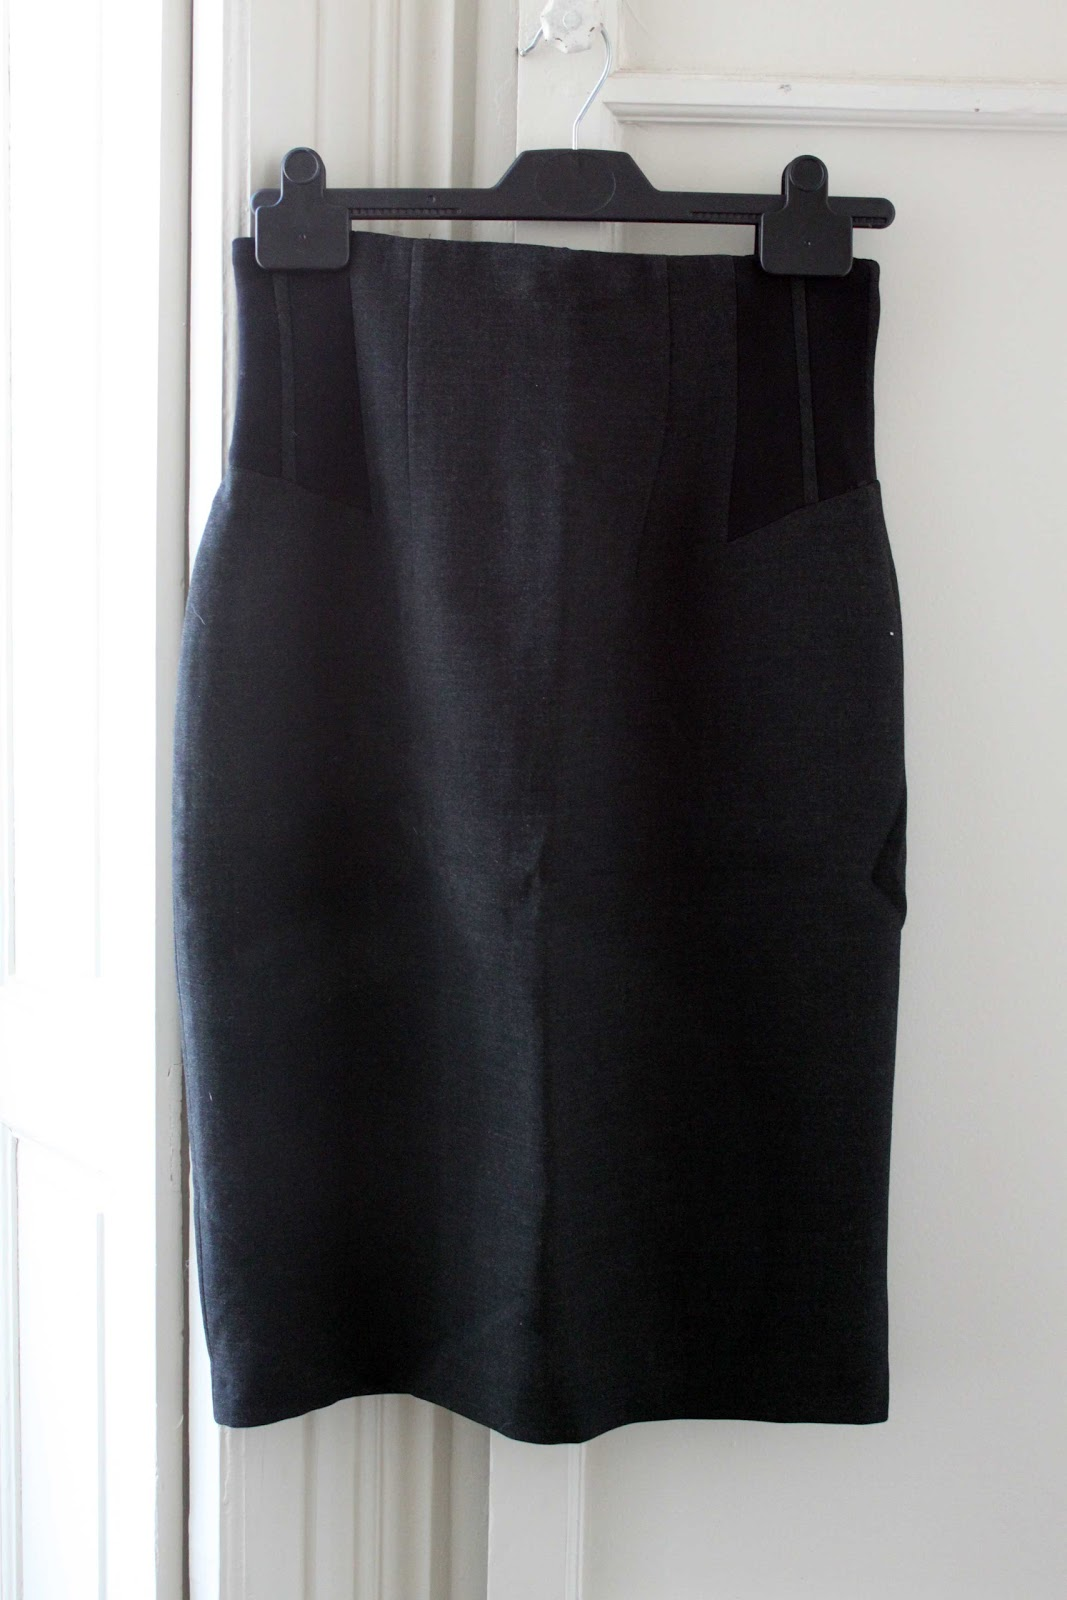 2ee7a6d6ee7a11 mon dressing à bas prix: jupe taille haute Zara